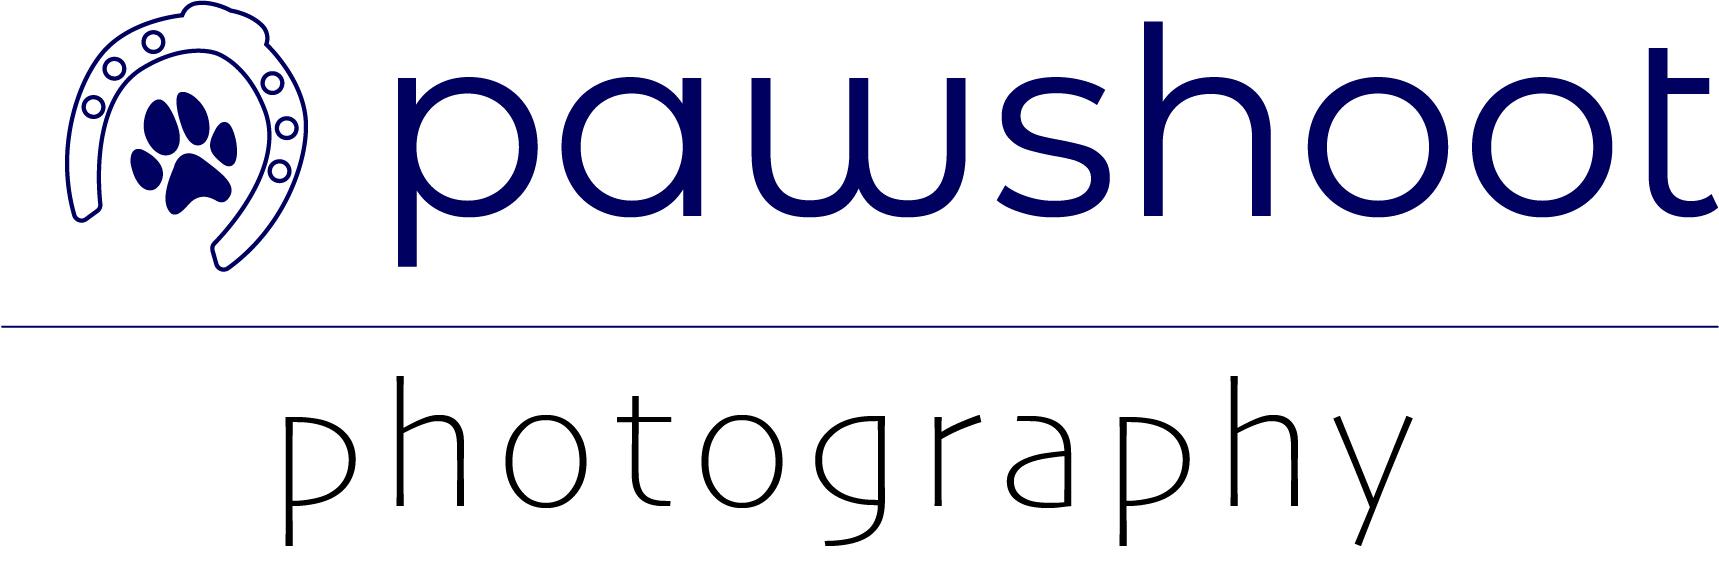 logo Pawshoot hondenfotografie